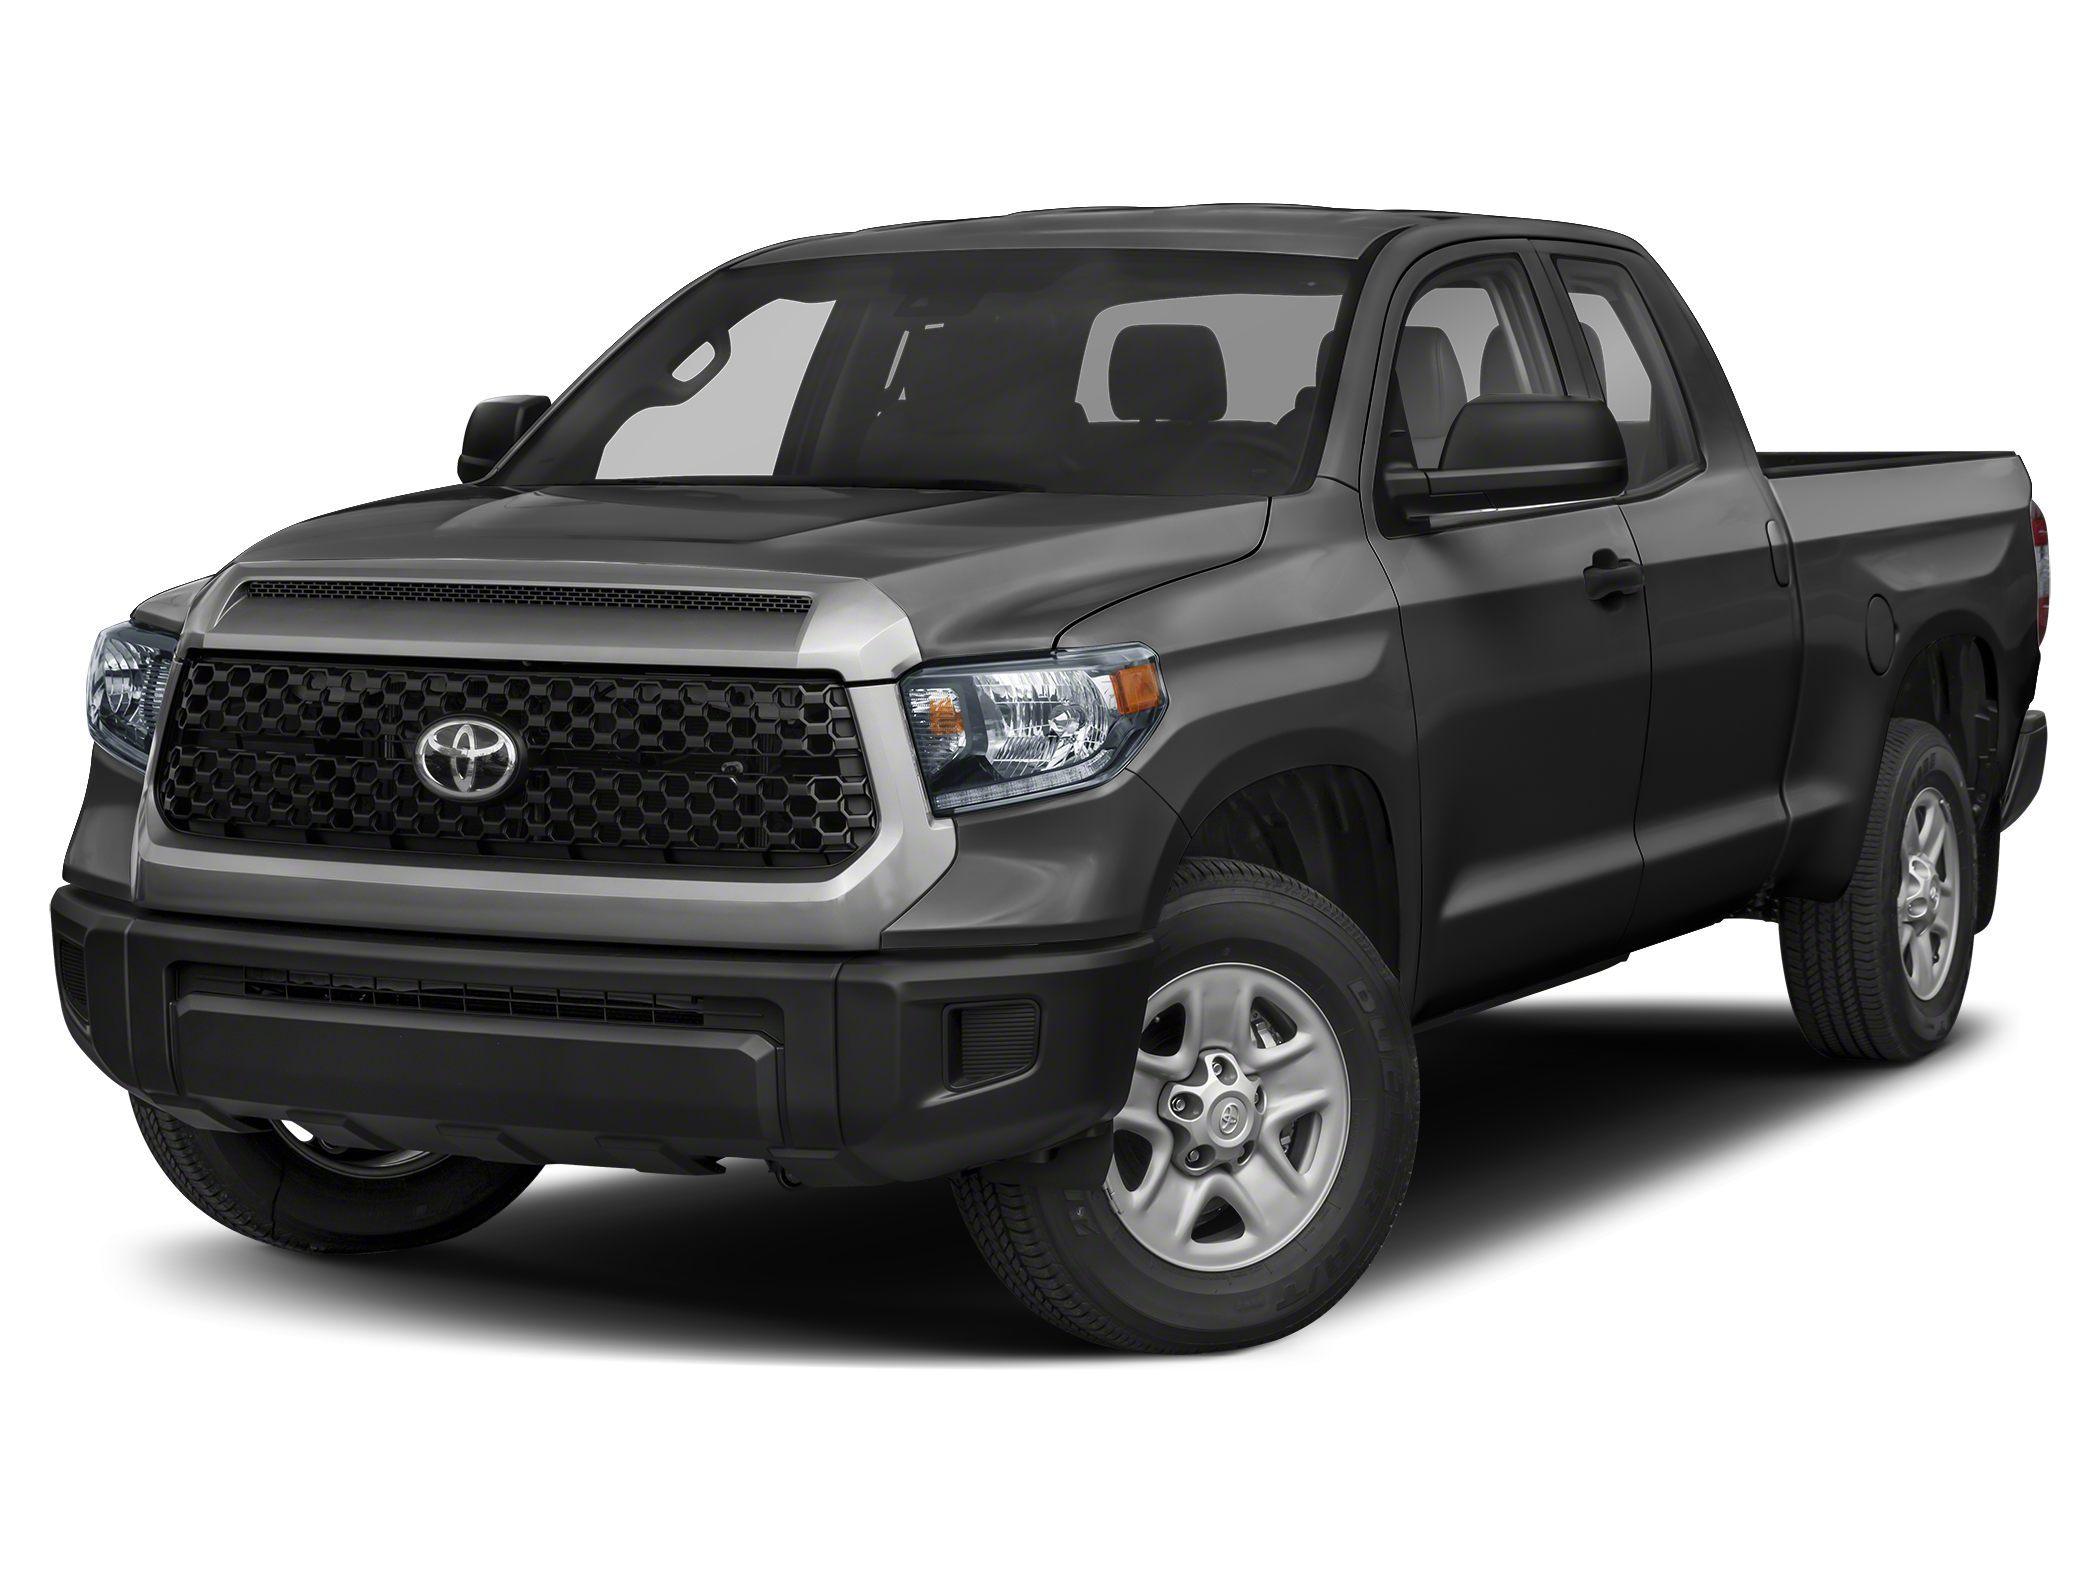 Certified 2019 Toyota Tundra SR5 with VIN 5TFUW5F15KX802650 for sale in Maplewood, Minnesota